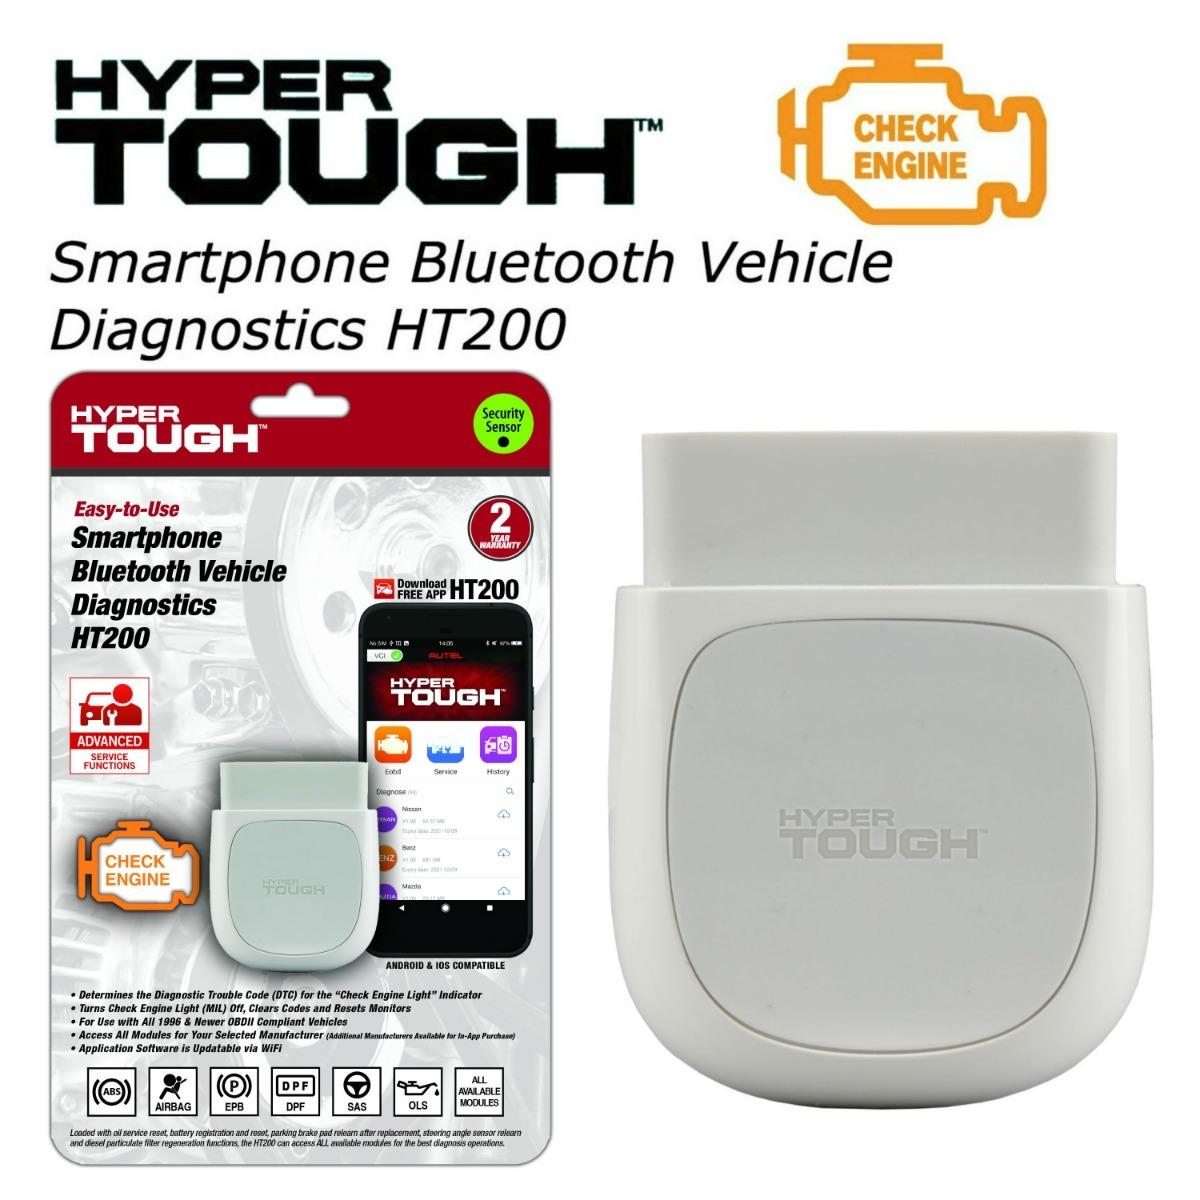 Hyper Tough Herramienta De Escaneo Bluetooth Autel Ht200